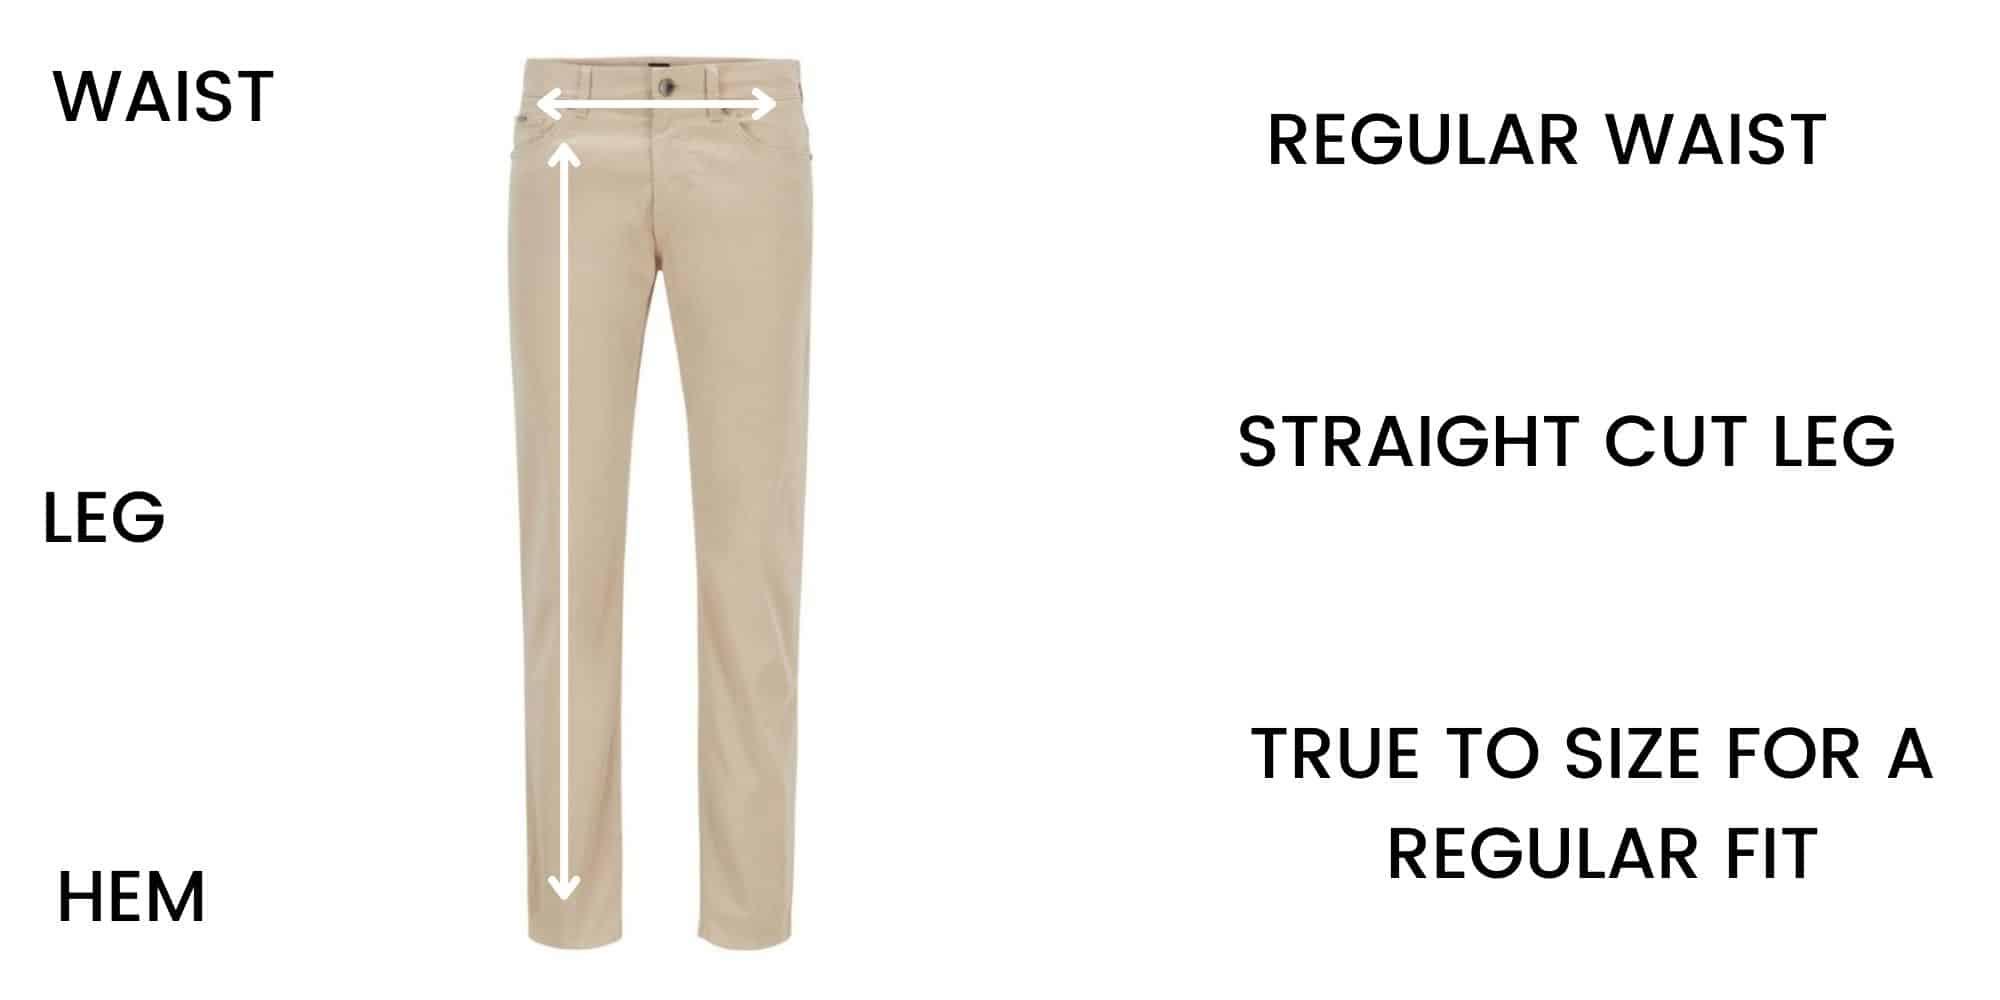 Boss Jeans Regular Fit Size Chart